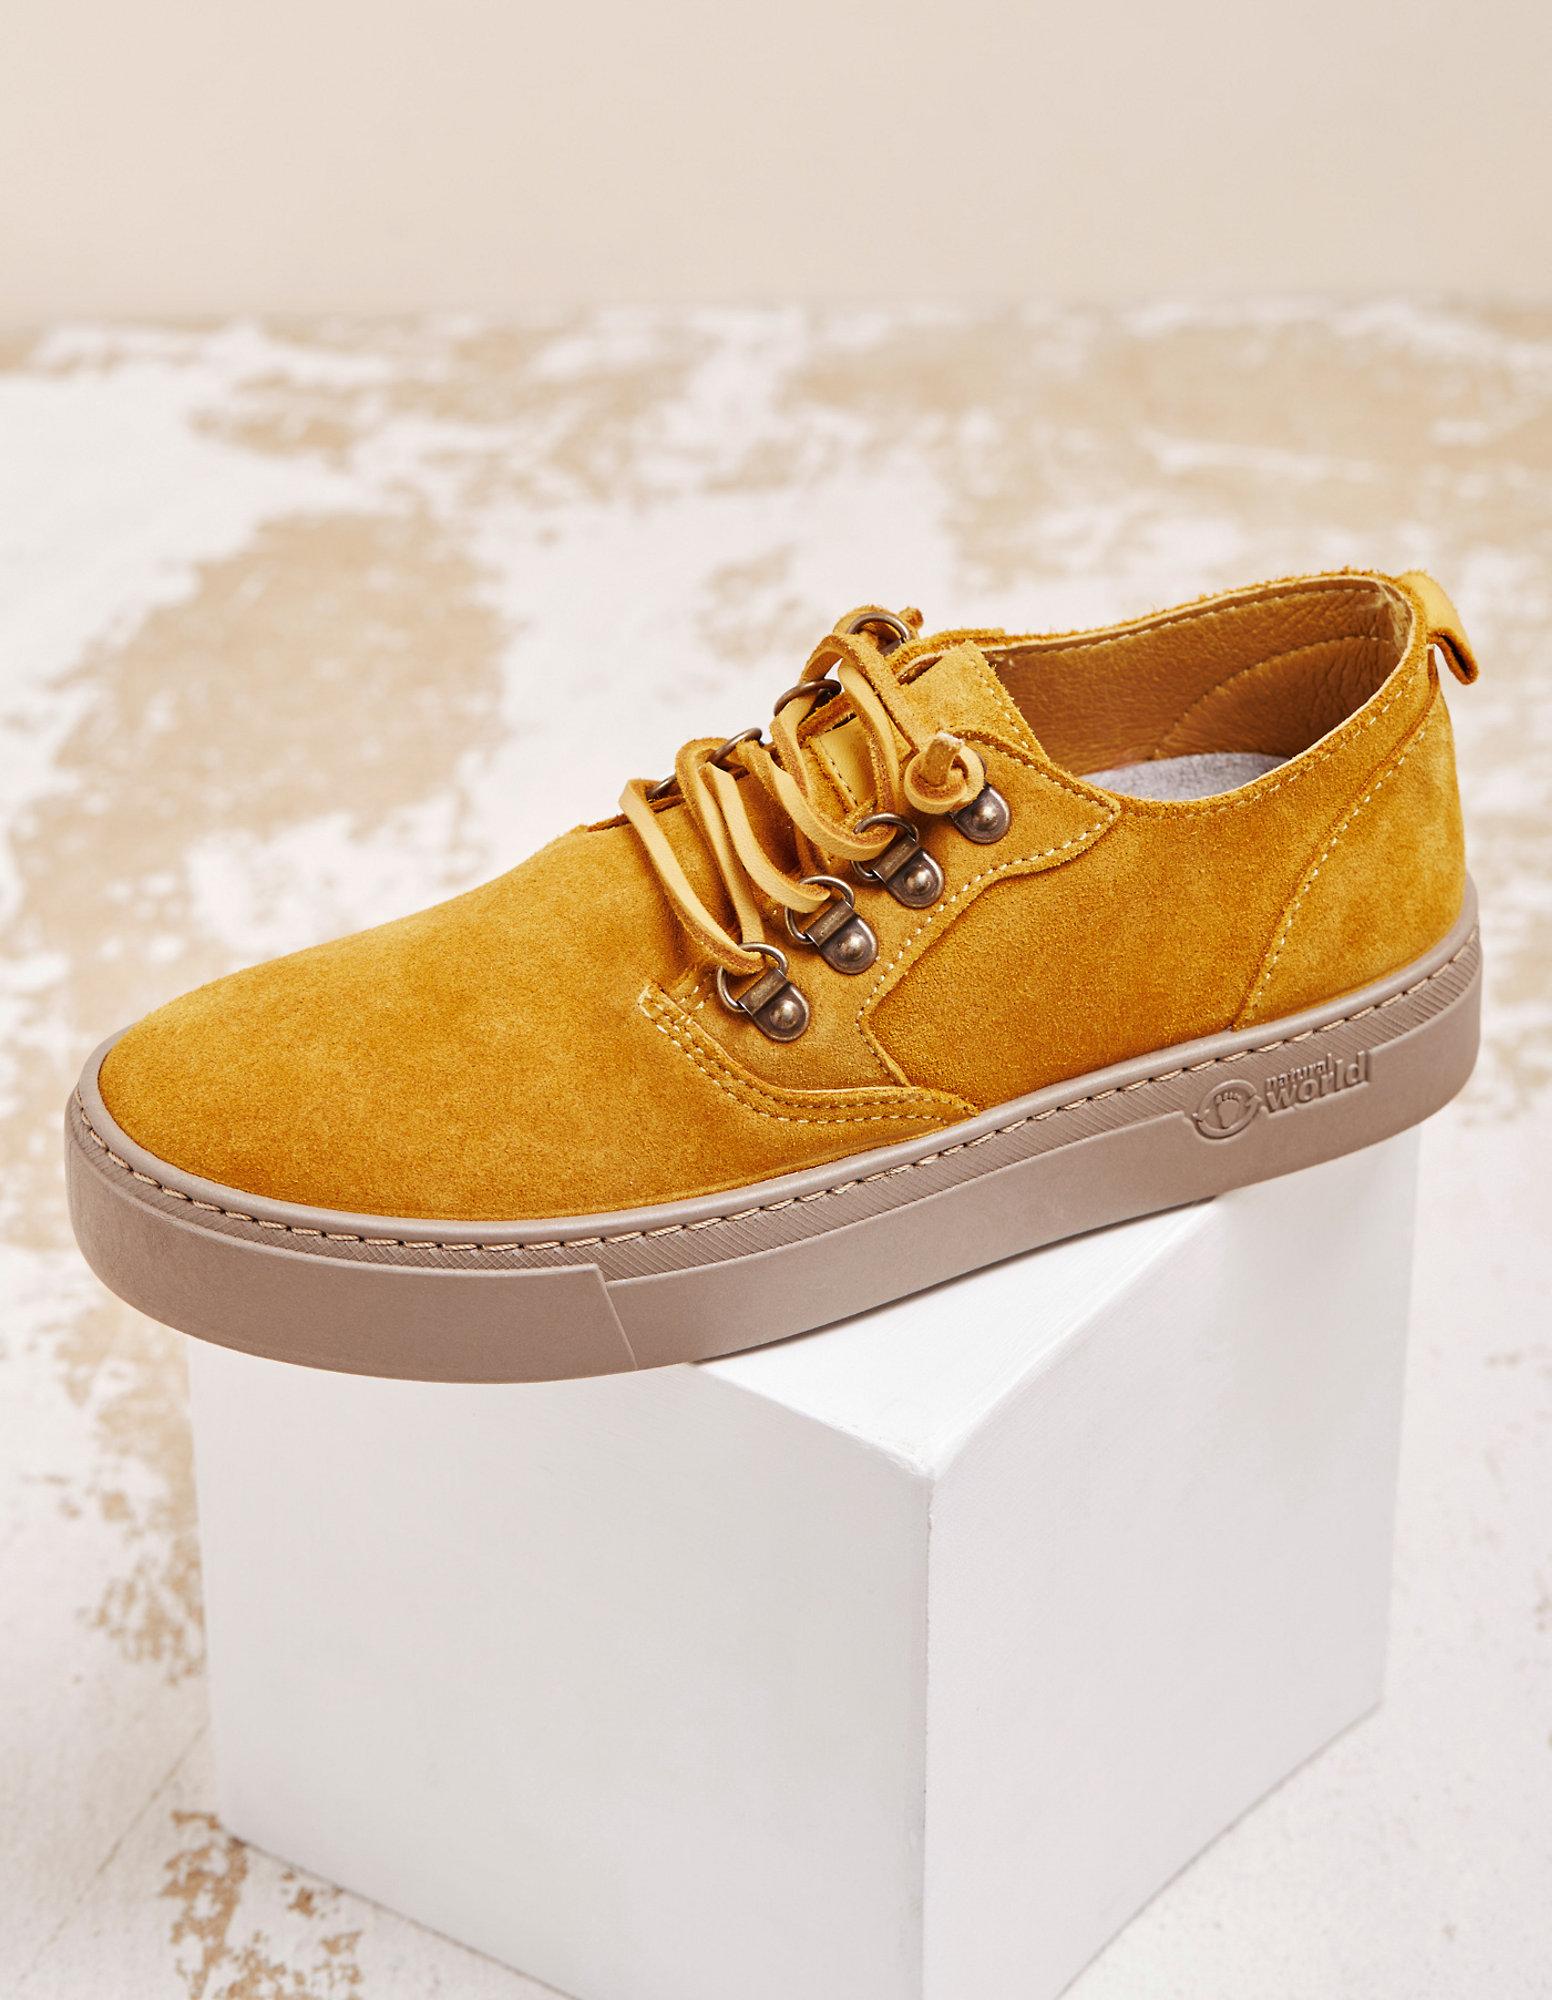 Shop für Damenmode : Senf Betreiben Offene Leder Hohe Schuhe